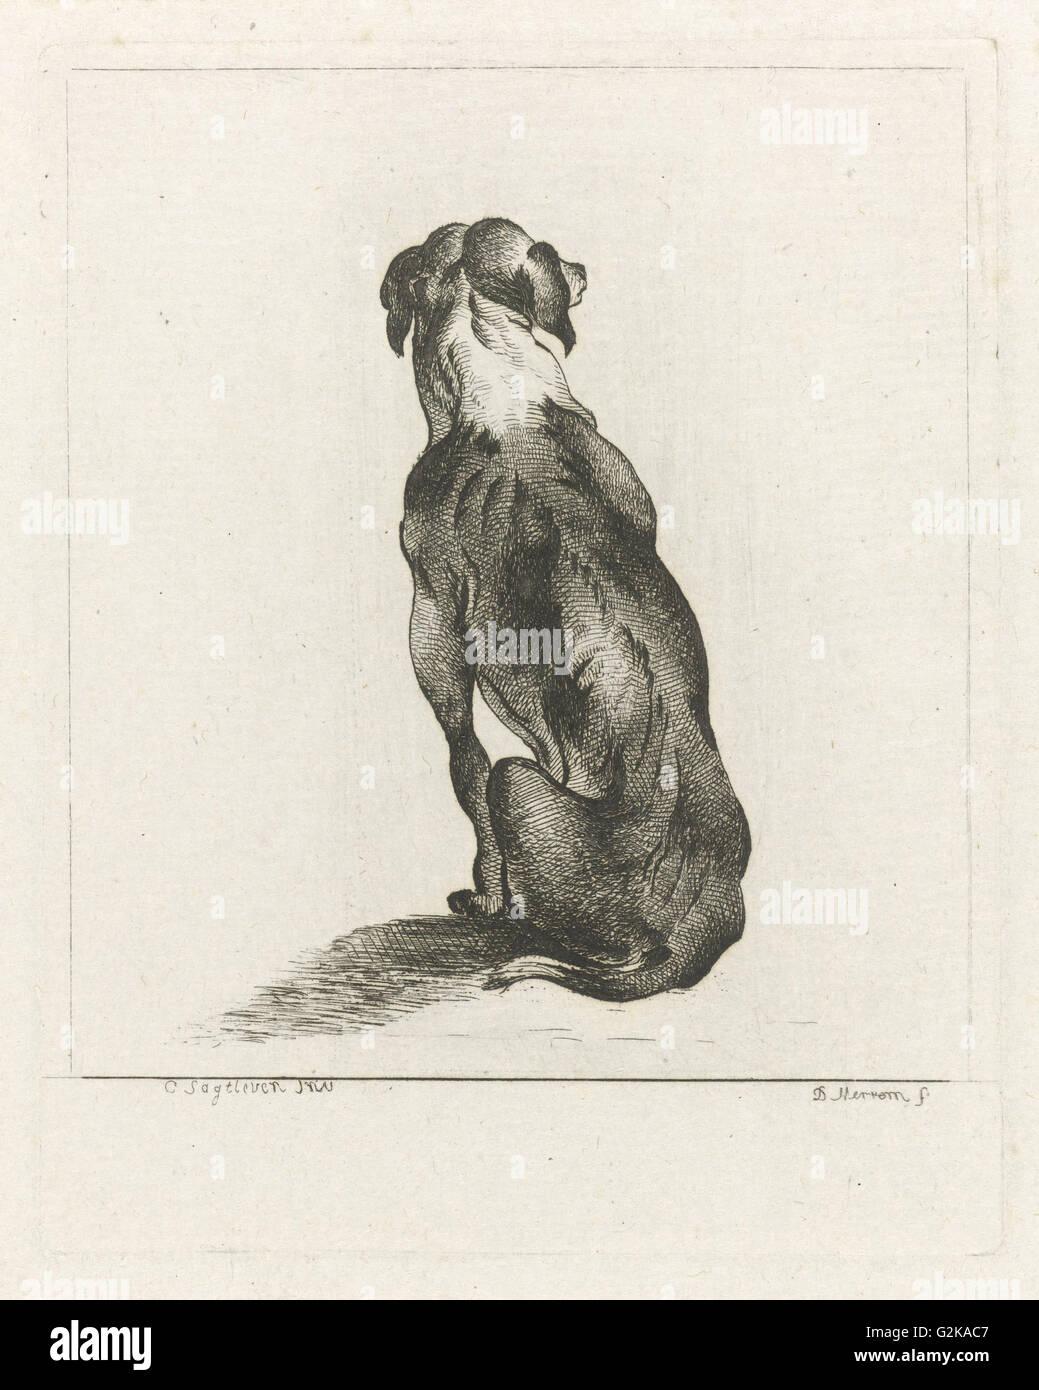 Sitting dog, D. Merrem, 1700 - 1800 - Stock Image